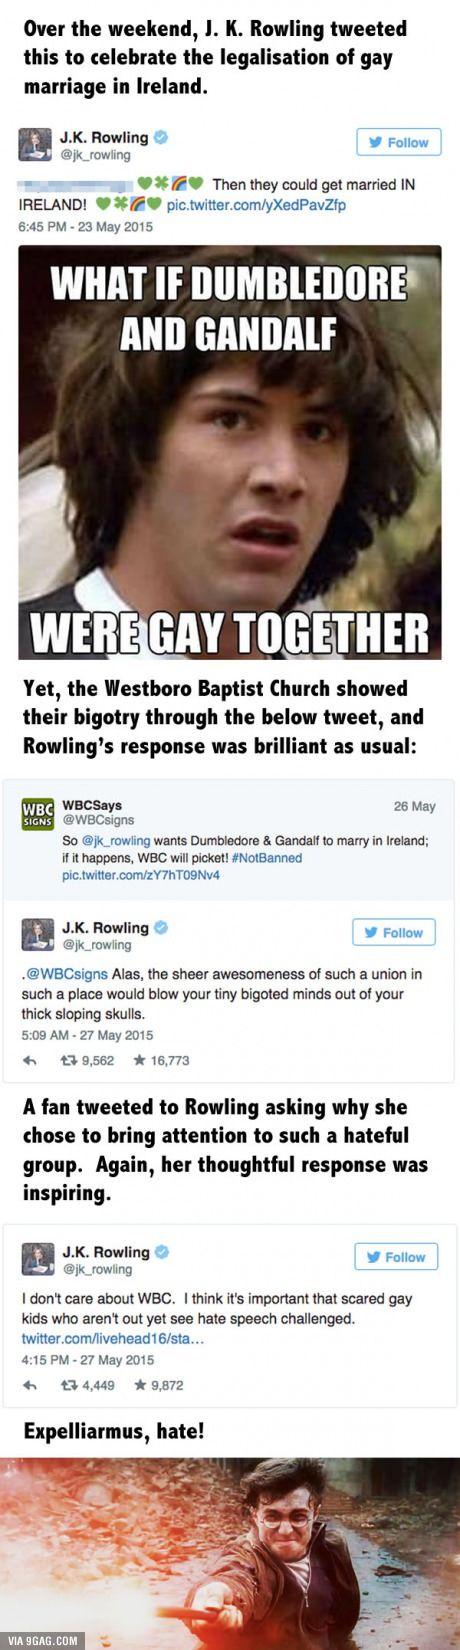 J.K. Rowling Tweet Slams The Westboro Baptist Church For Their Hateful Message. You da real MVP!